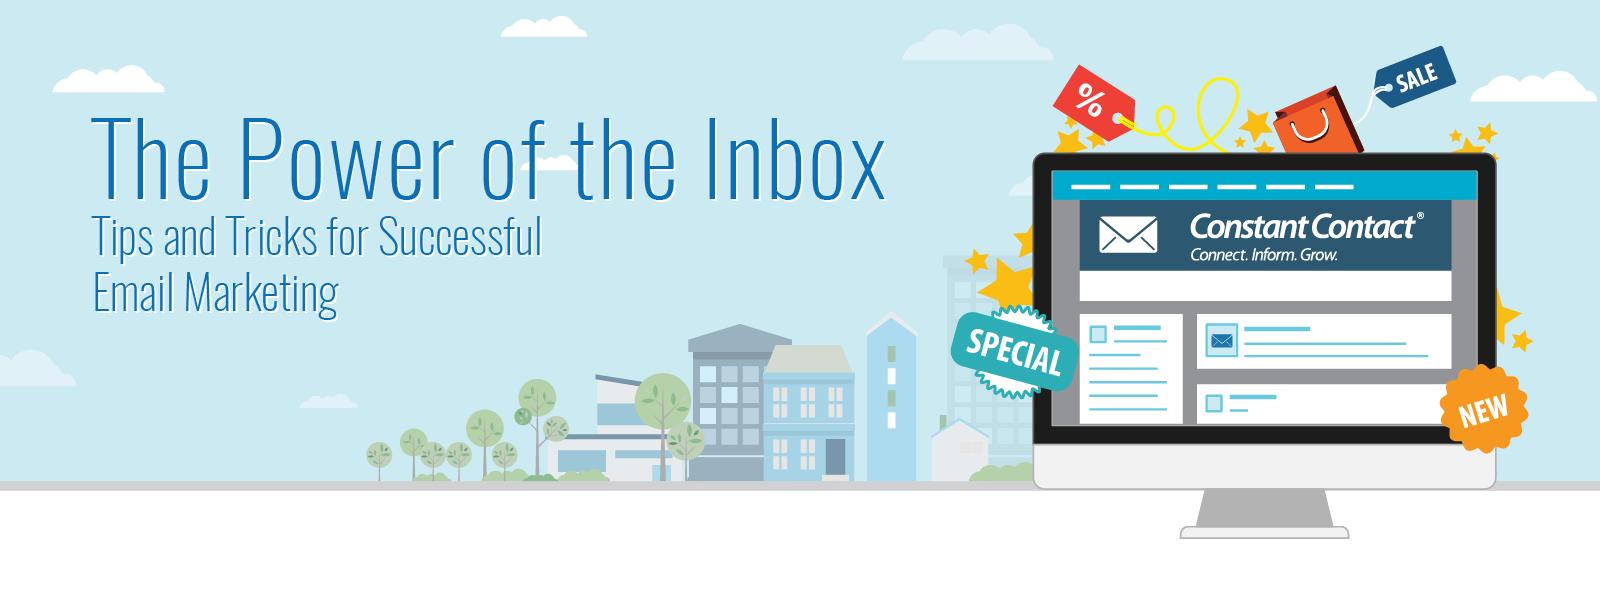 Power-of-Inbox-TrainingWebsite-1600x594